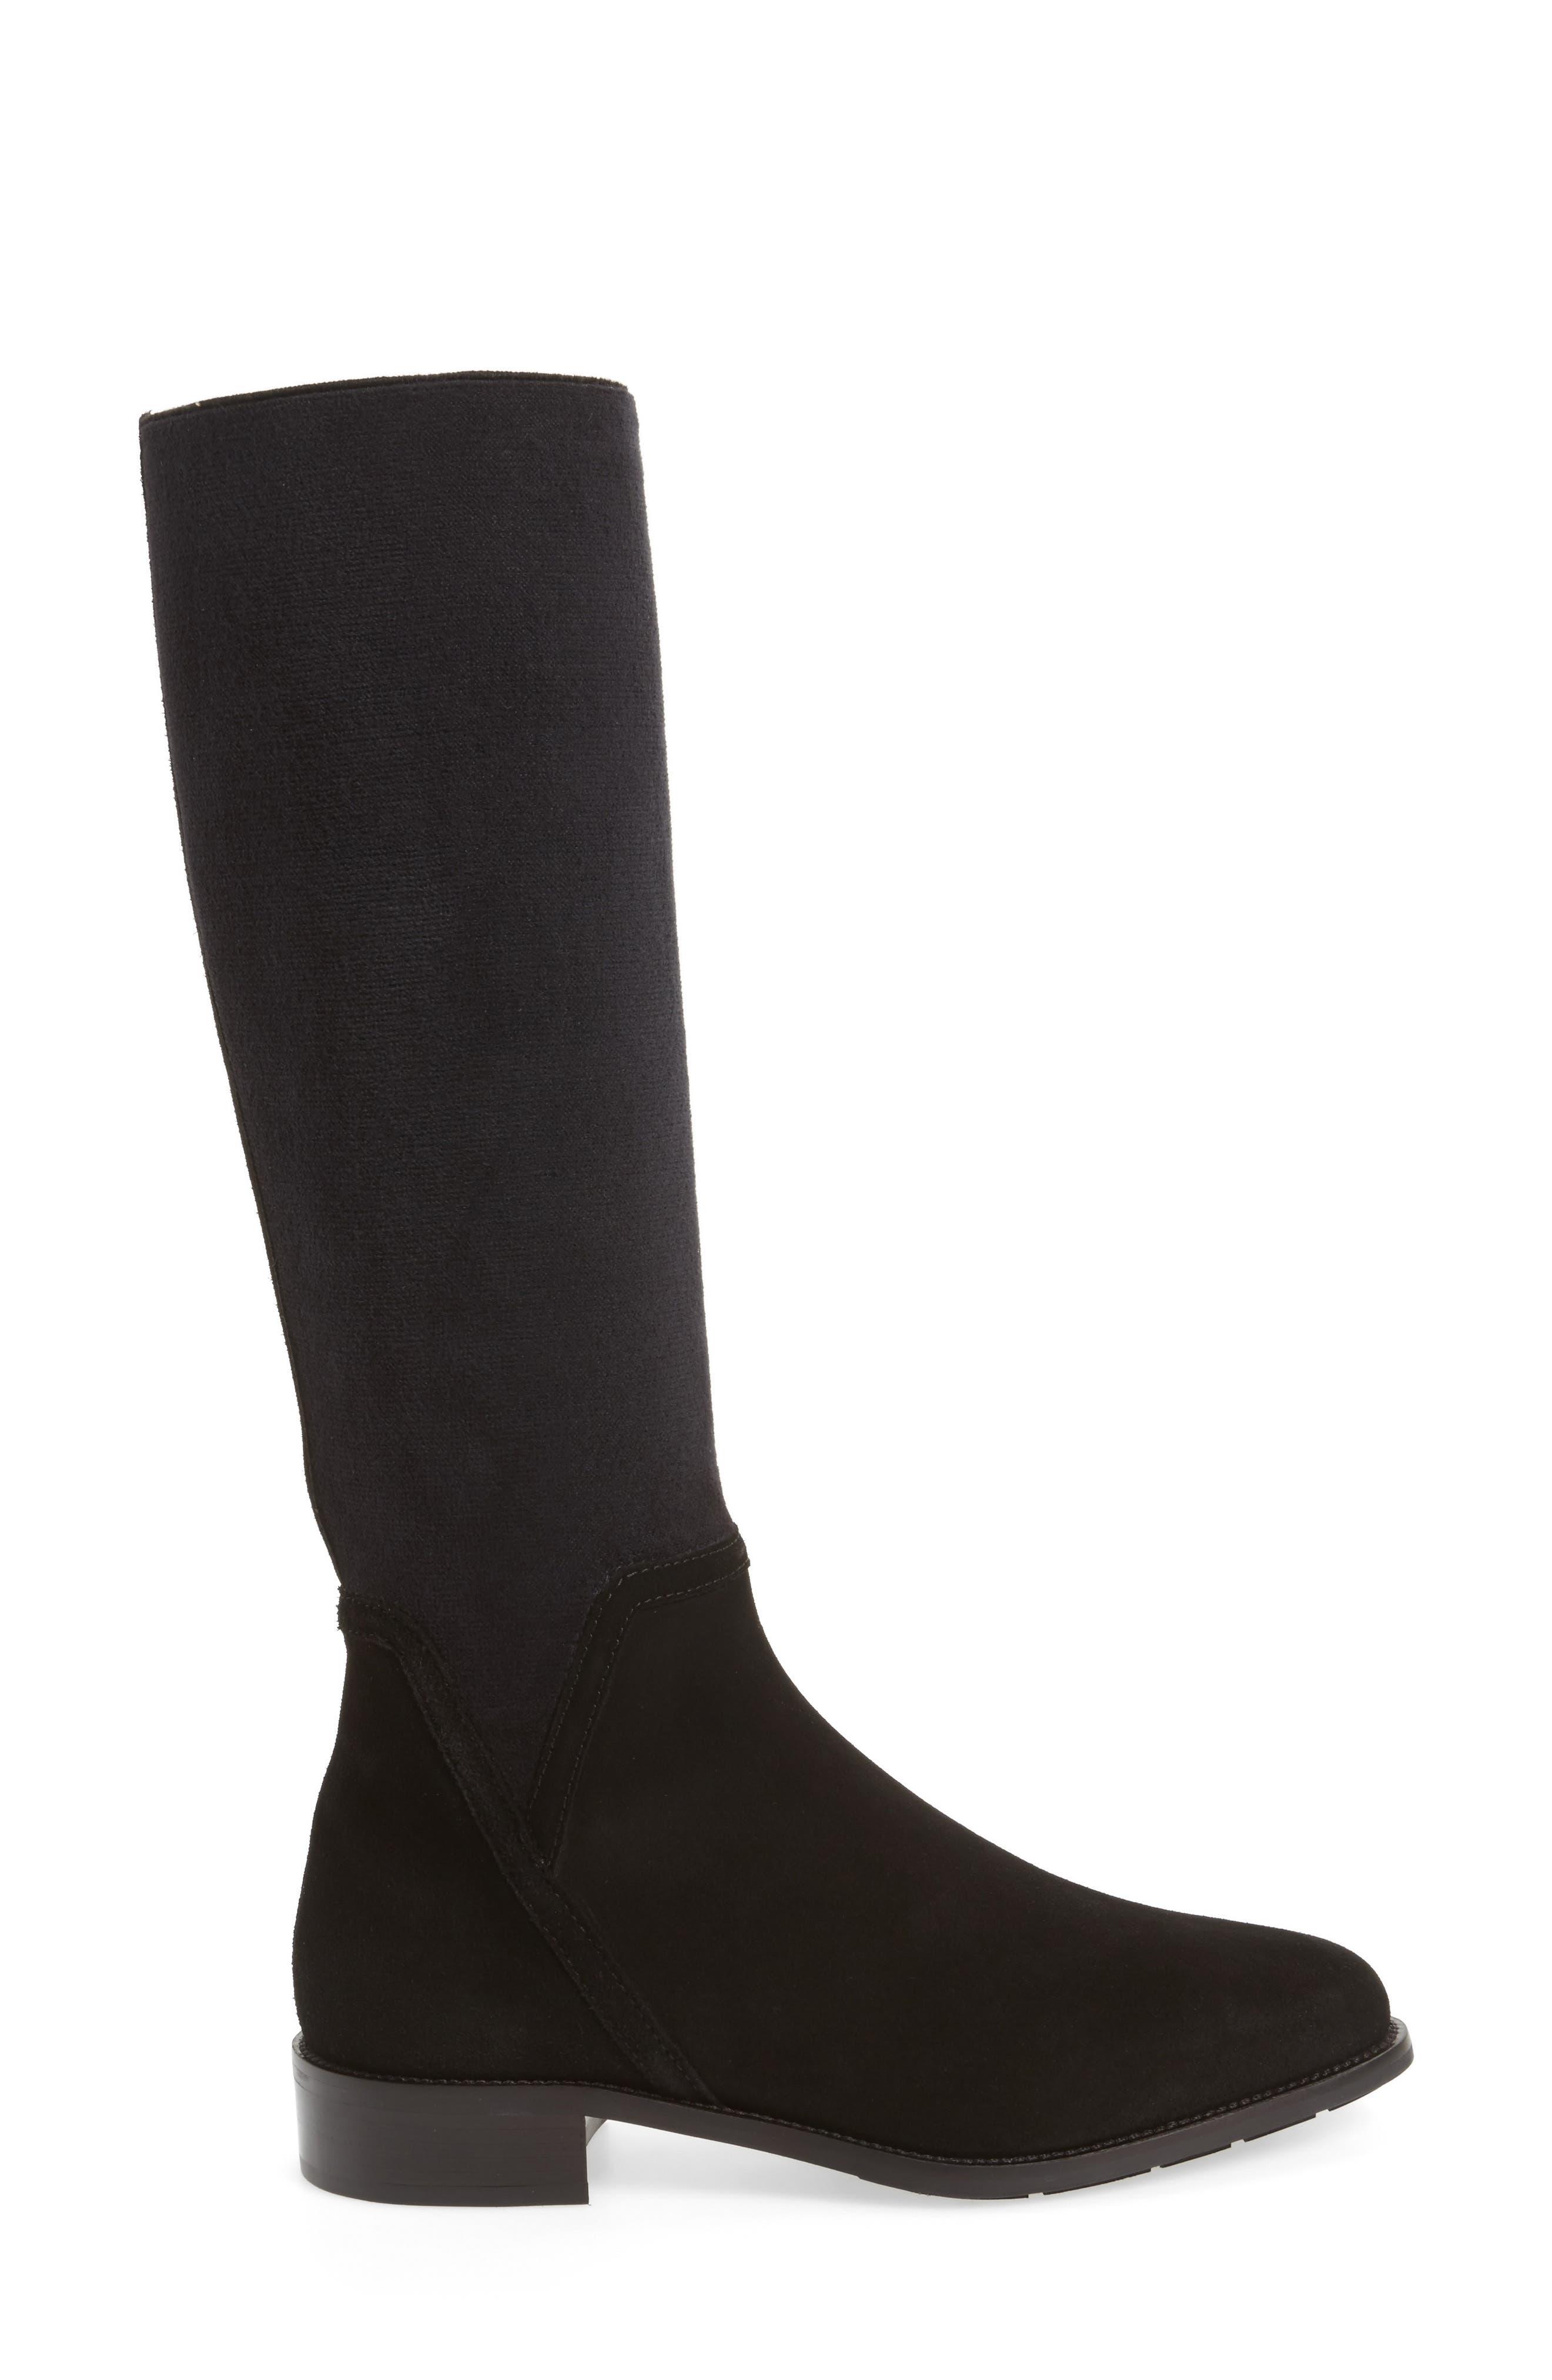 Alternate Image 3  - Aquatalia Nicolette Knee High Weatherproof Boot (Women)